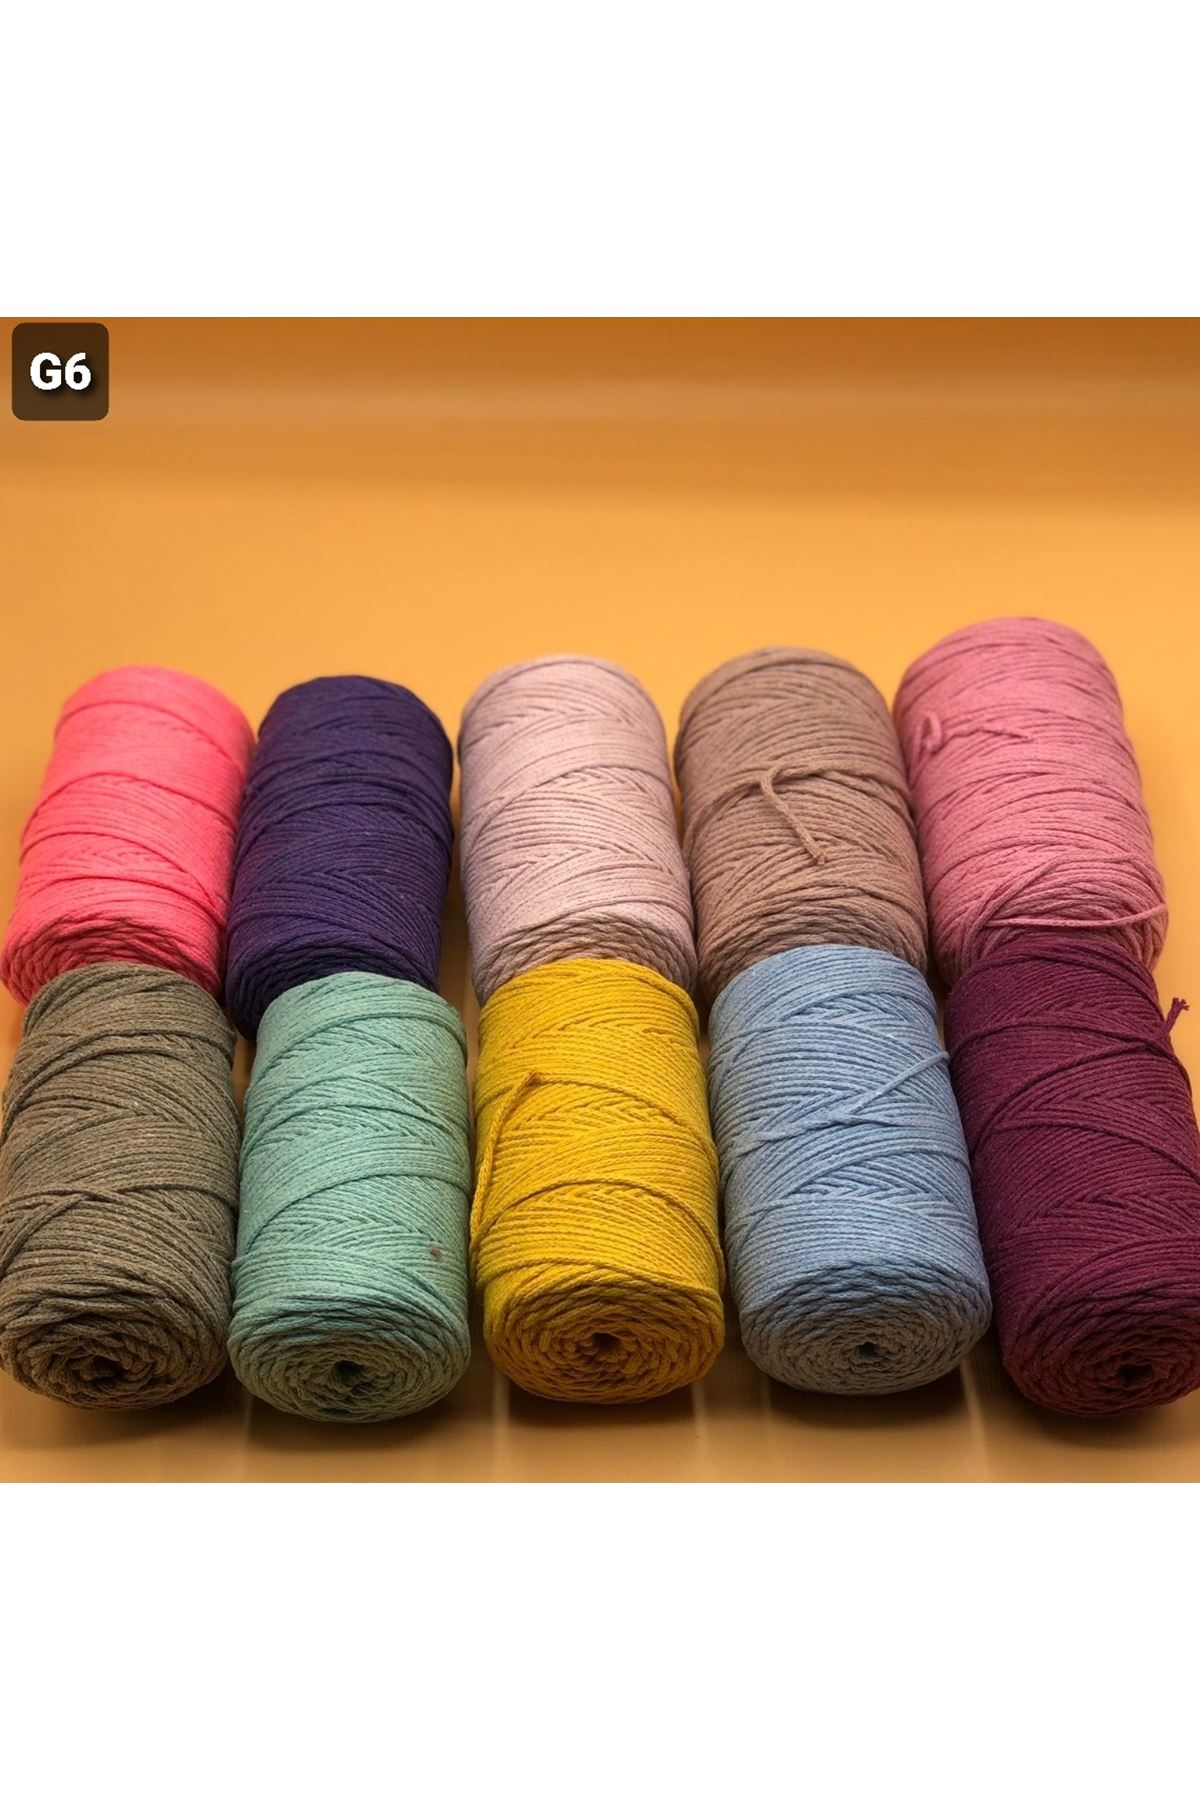 Cotton Makrome MIX Paket 2540 gram Grup 6